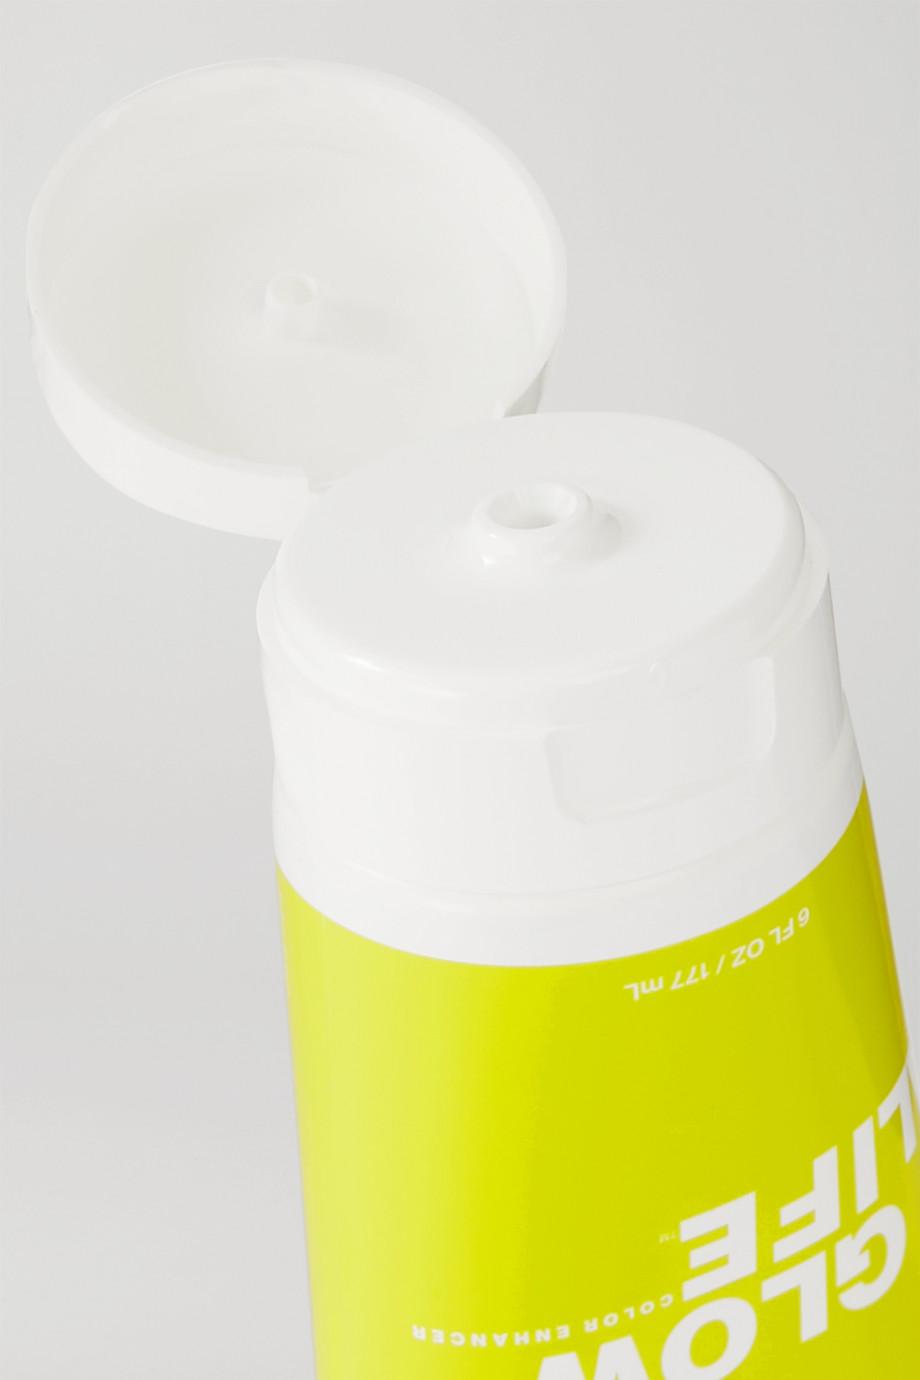 NORMAKAMALIFE Glow Color Enhancer, 177ml